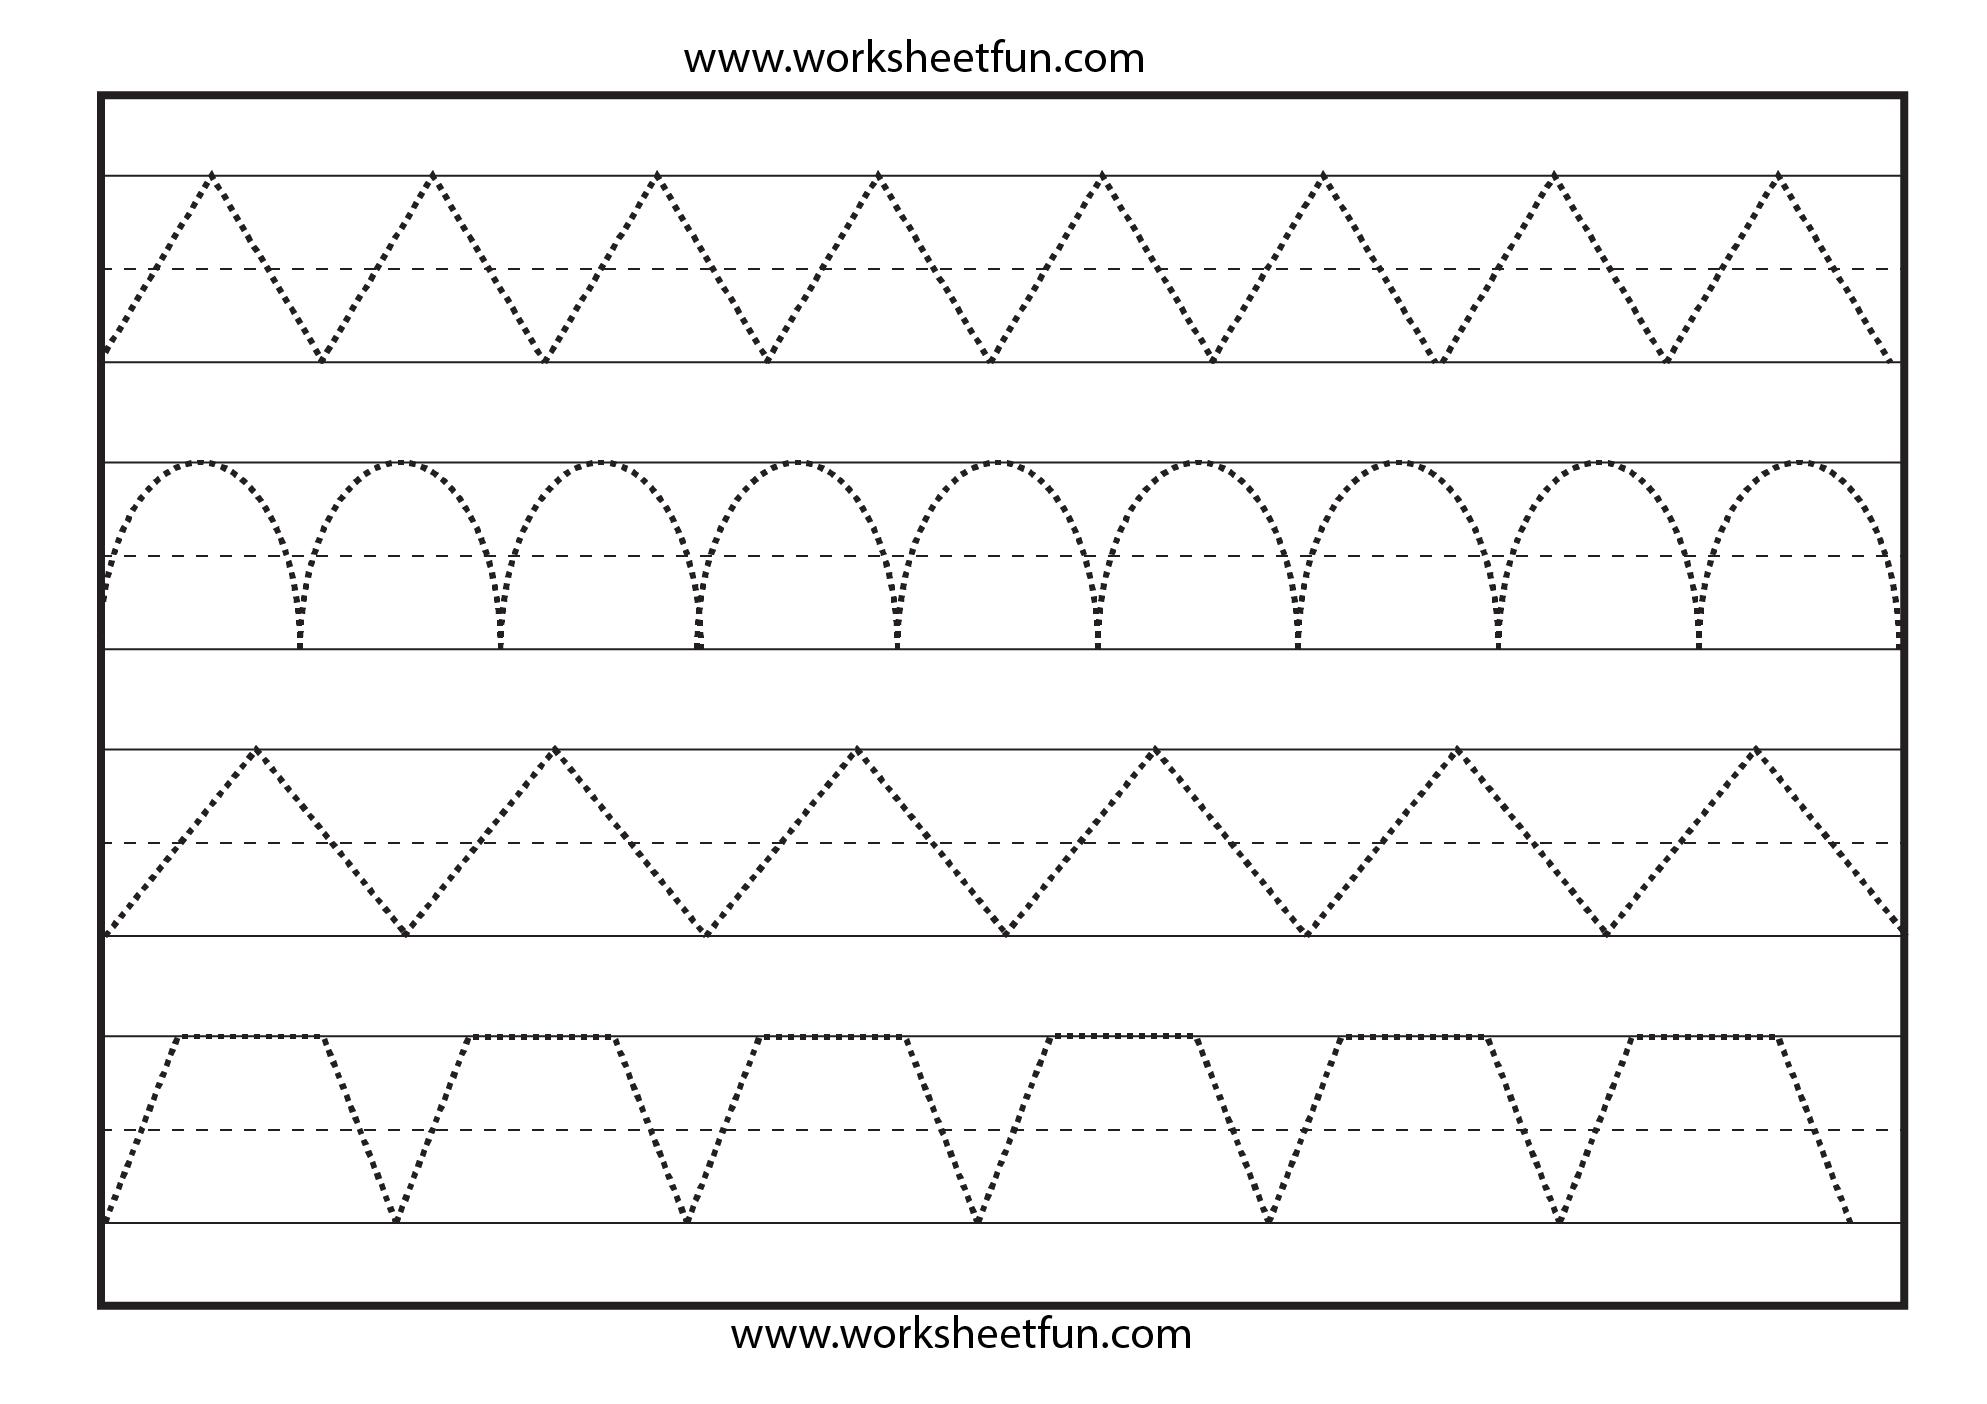 Line Tracing – 1 Worksheet / Free Printable Worksheets – Worksheetfun - Free Printable Preschool Worksheets Tracing Lines